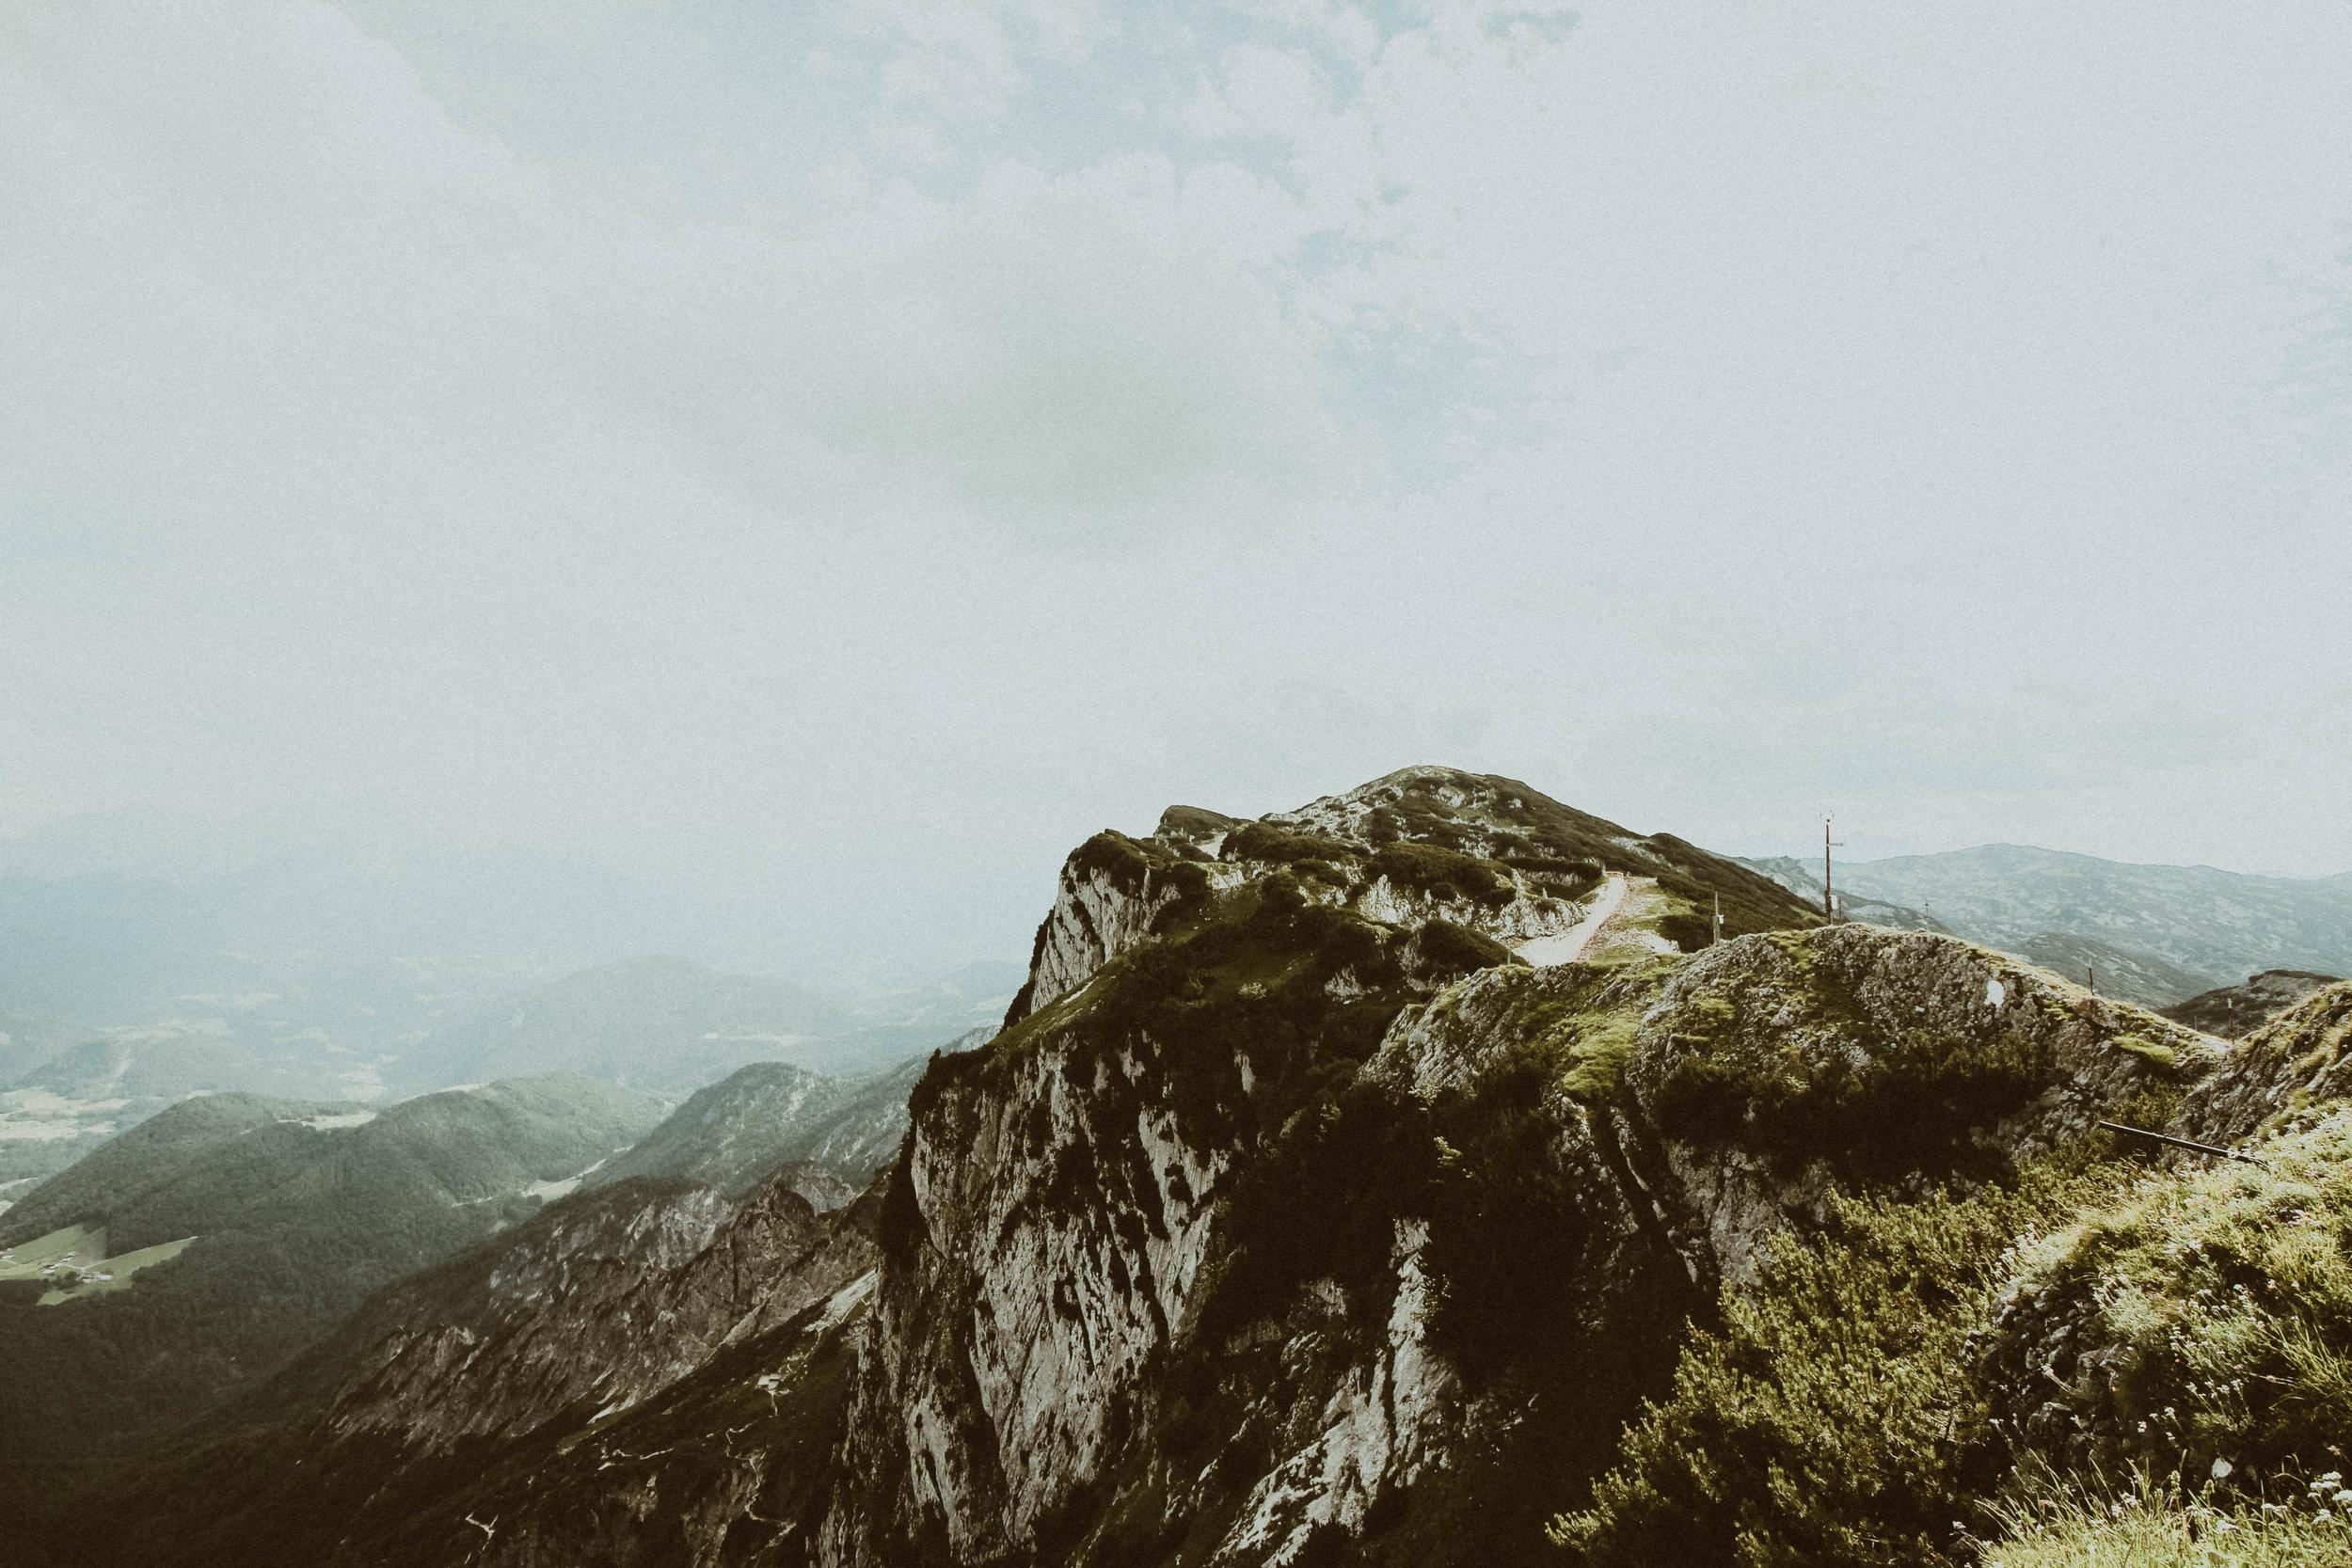 2. Bavarian Alps (Austria)